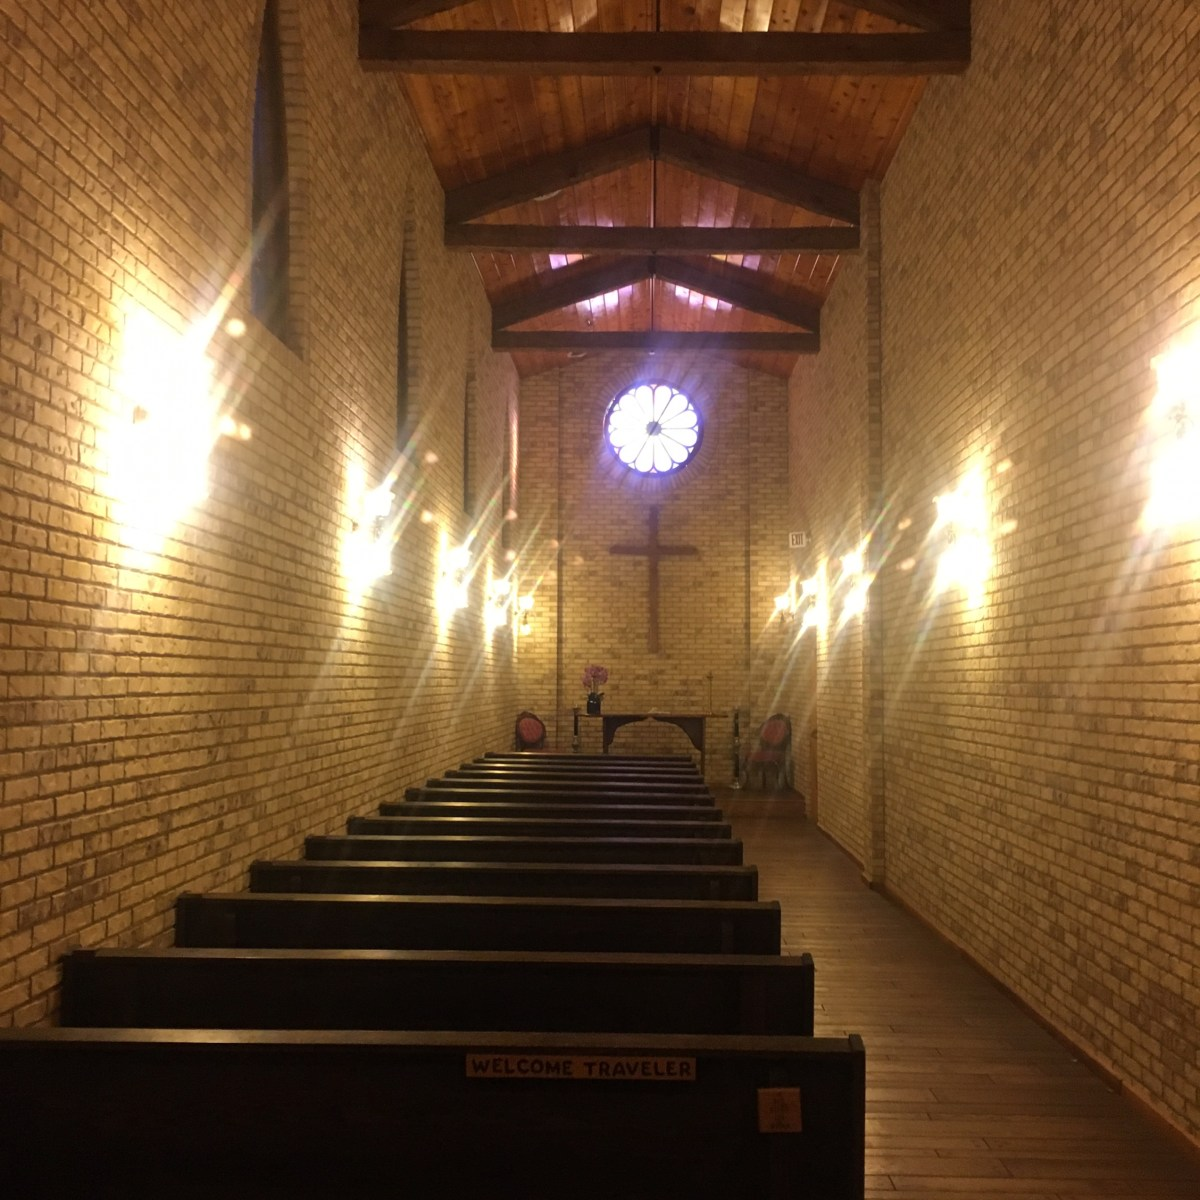 The Travelers Chapel Wall Drug South Dakota